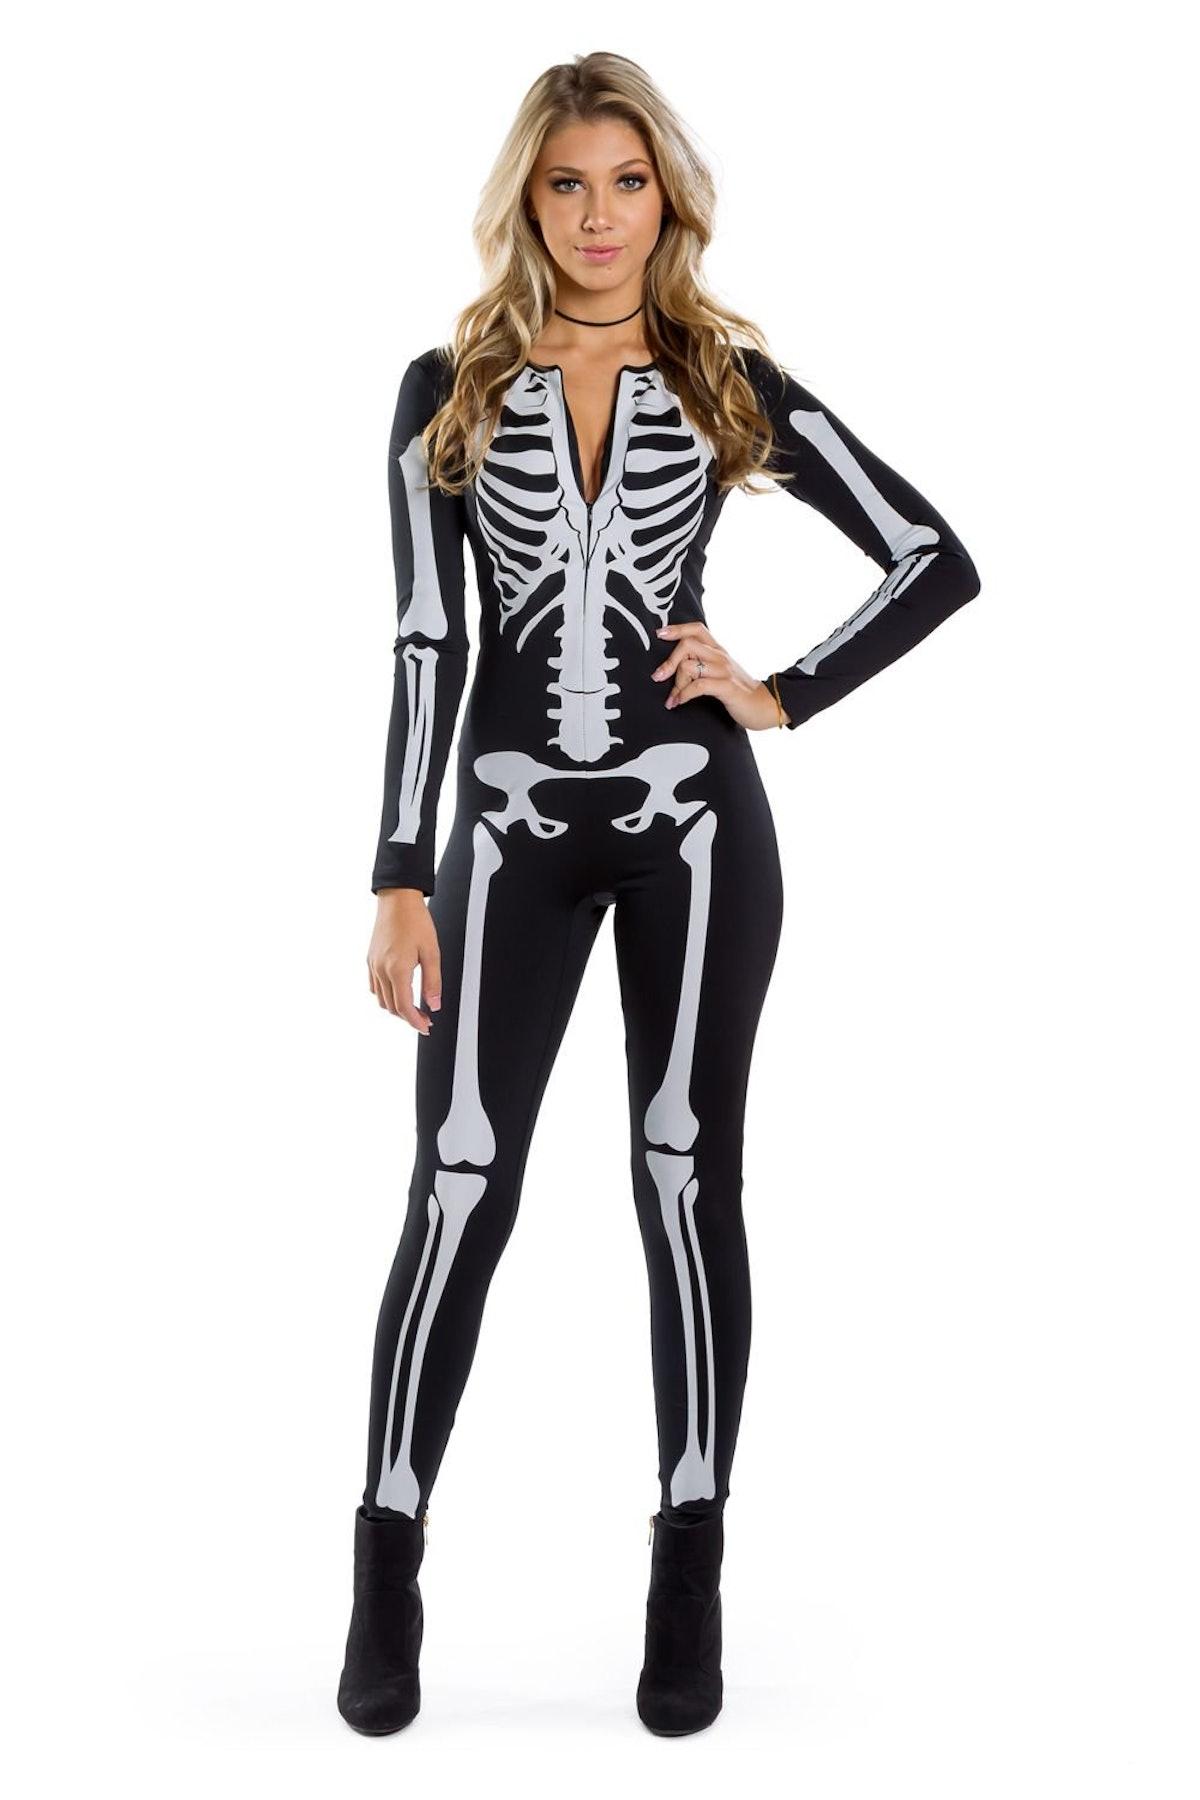 Skeleton Bodysuit Costume